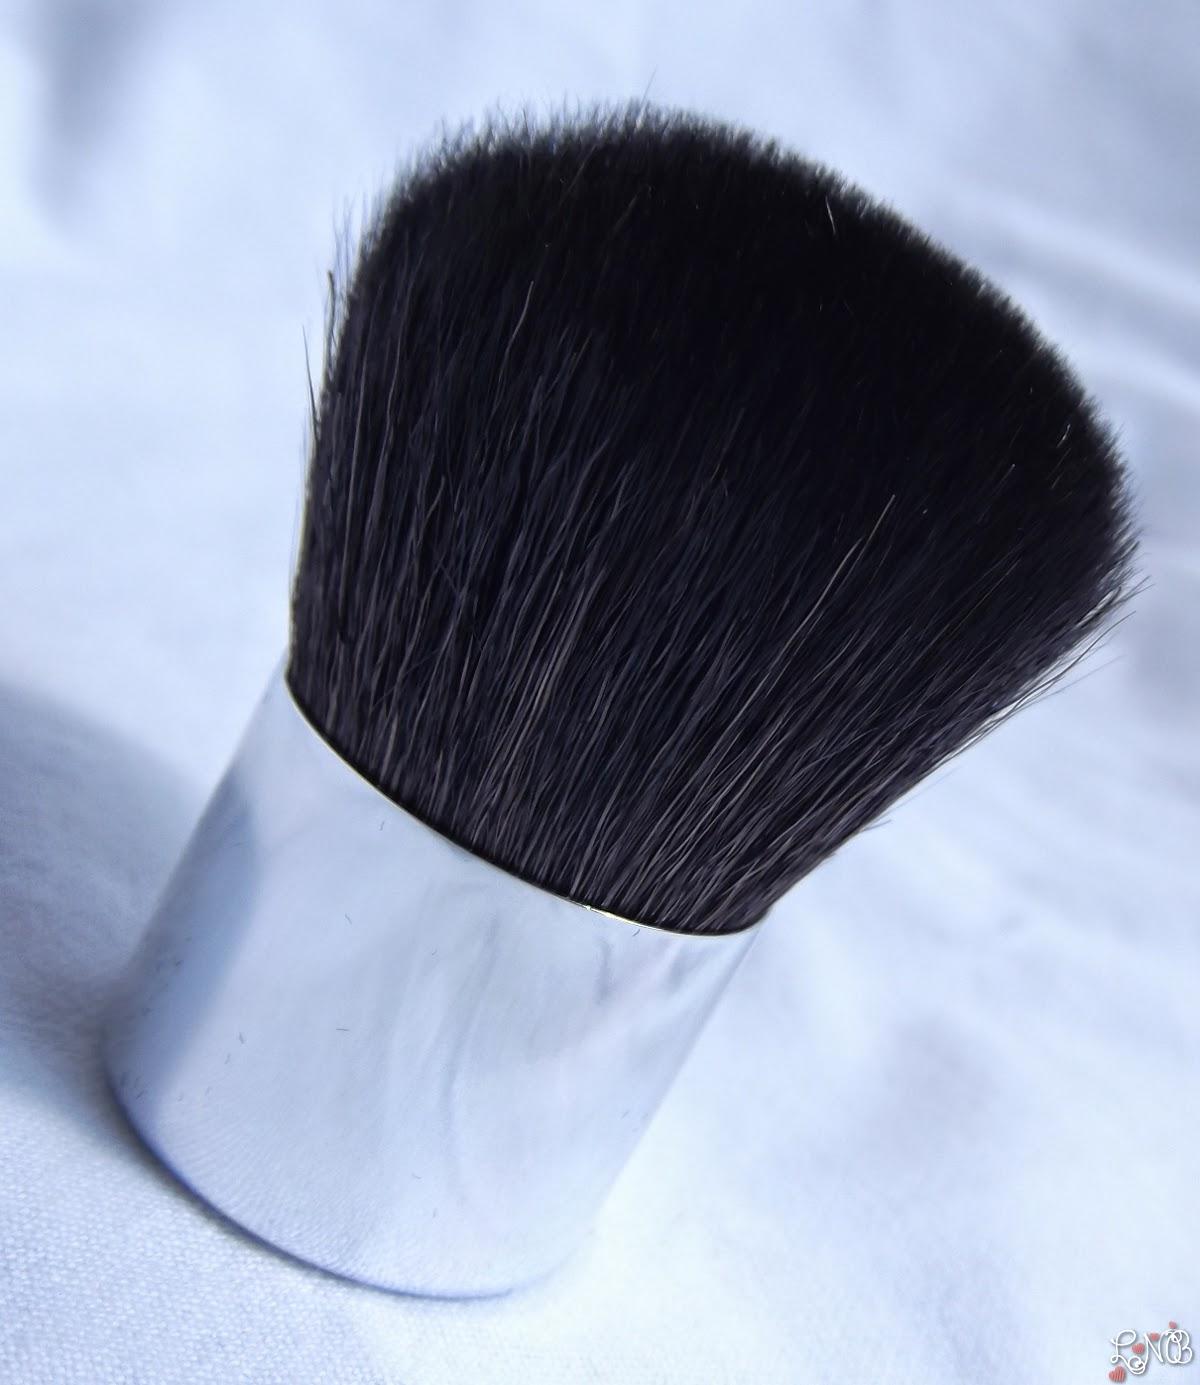 DIOR  Diorskin Nude Tan  Poudre de Soleil Kabuki Brush